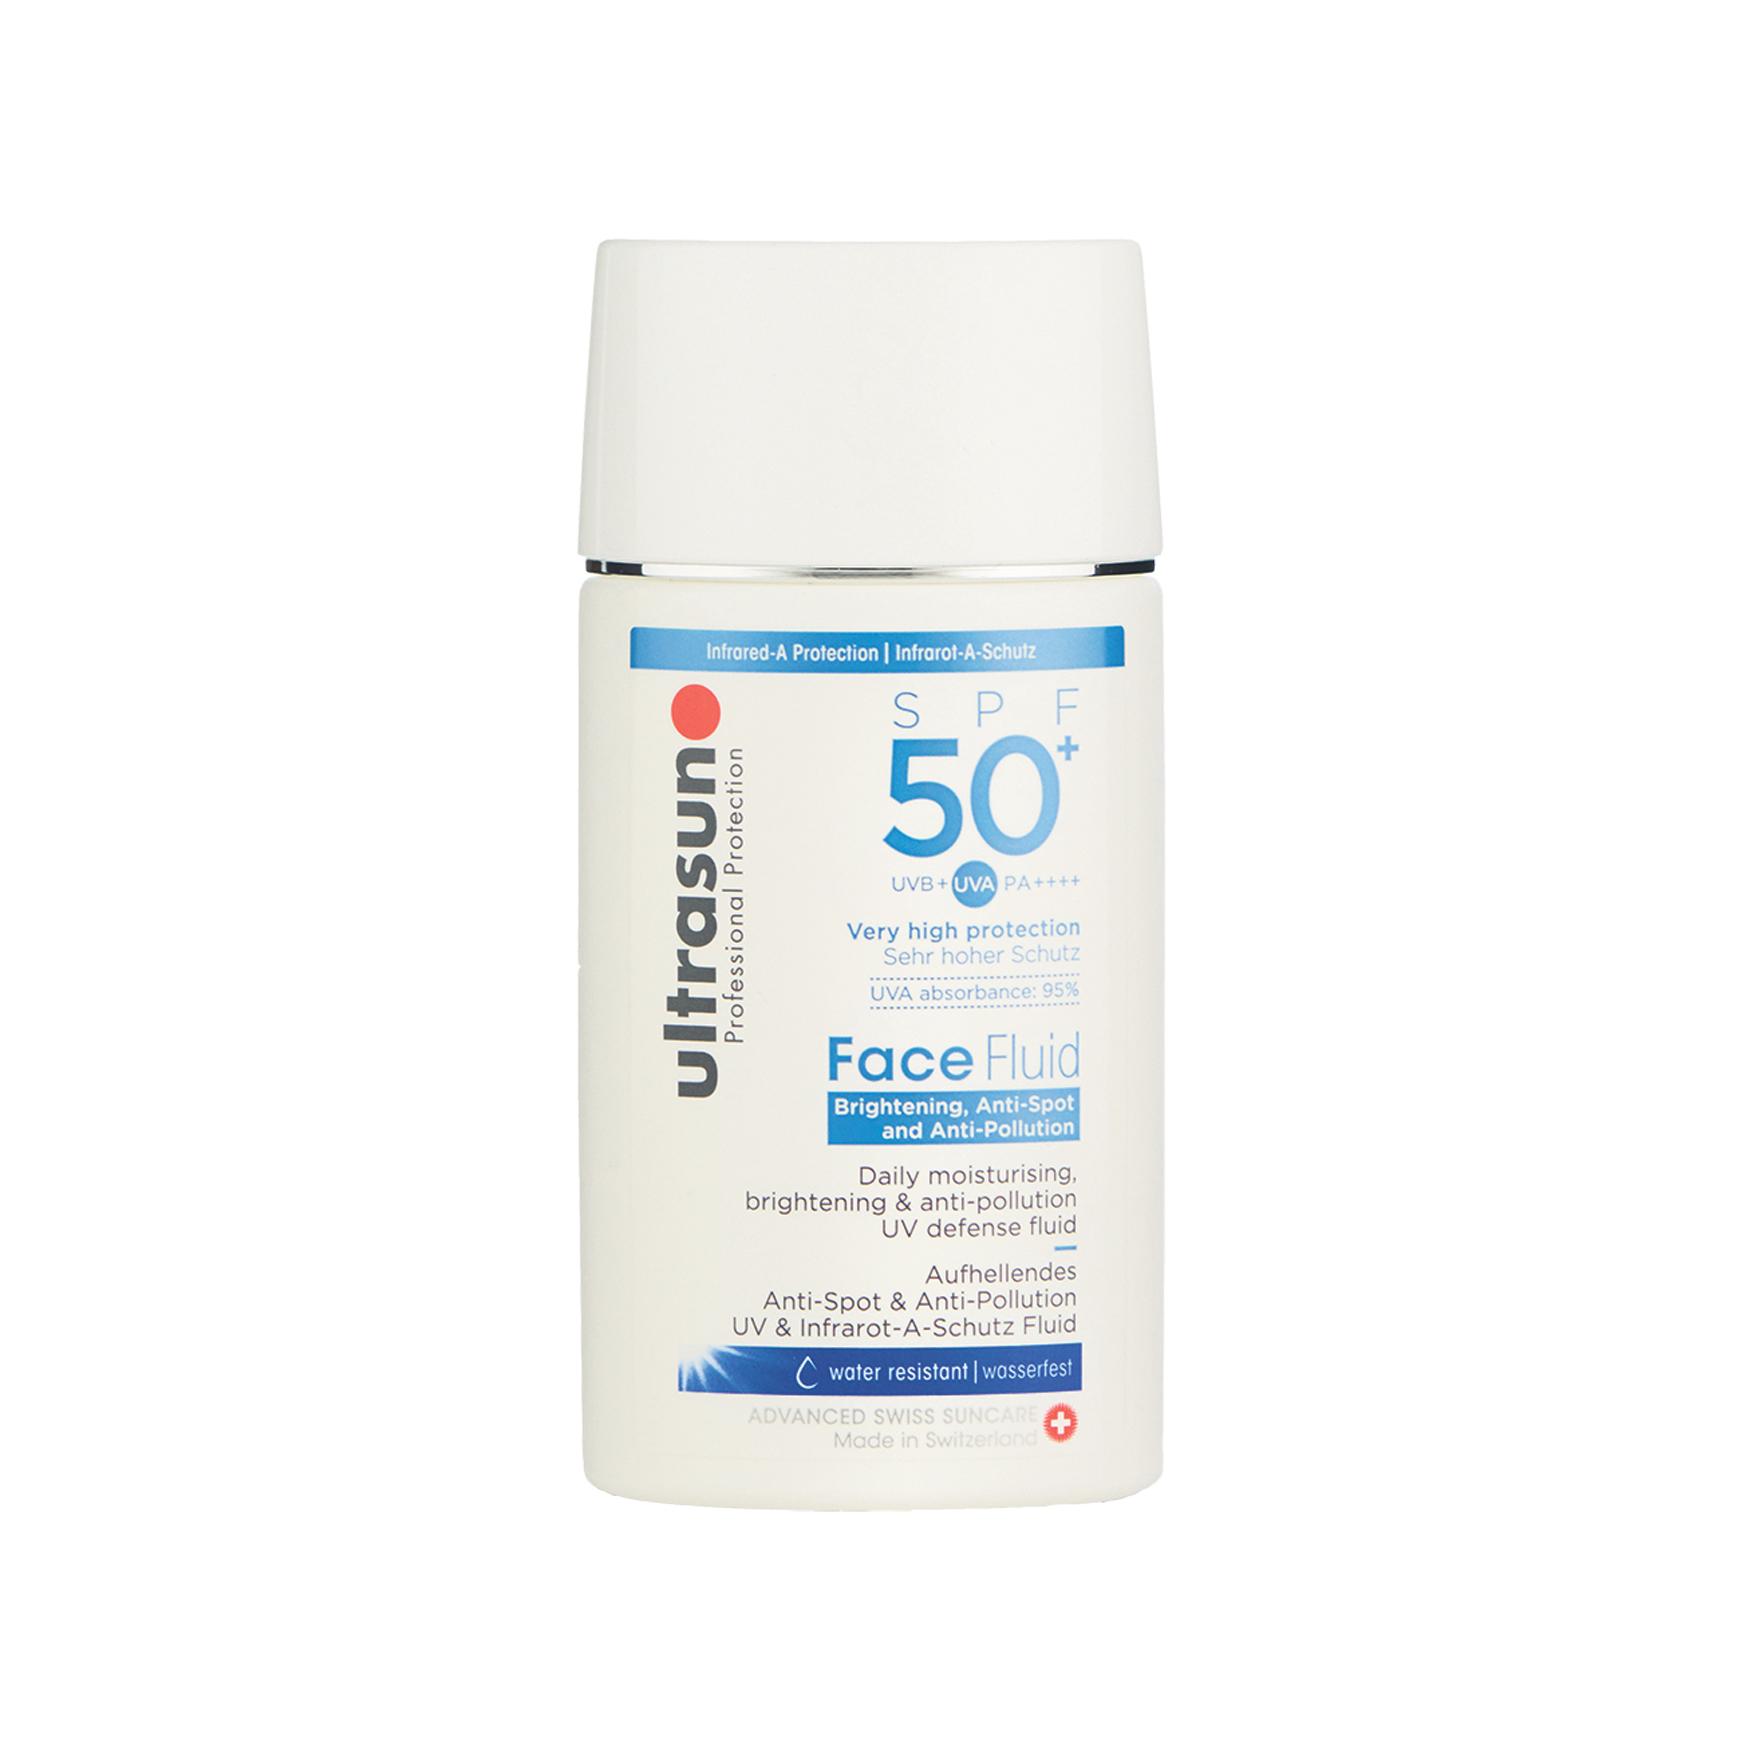 Face Fluid SPF50+ Anti-Spot & Anti-Pollution, , large